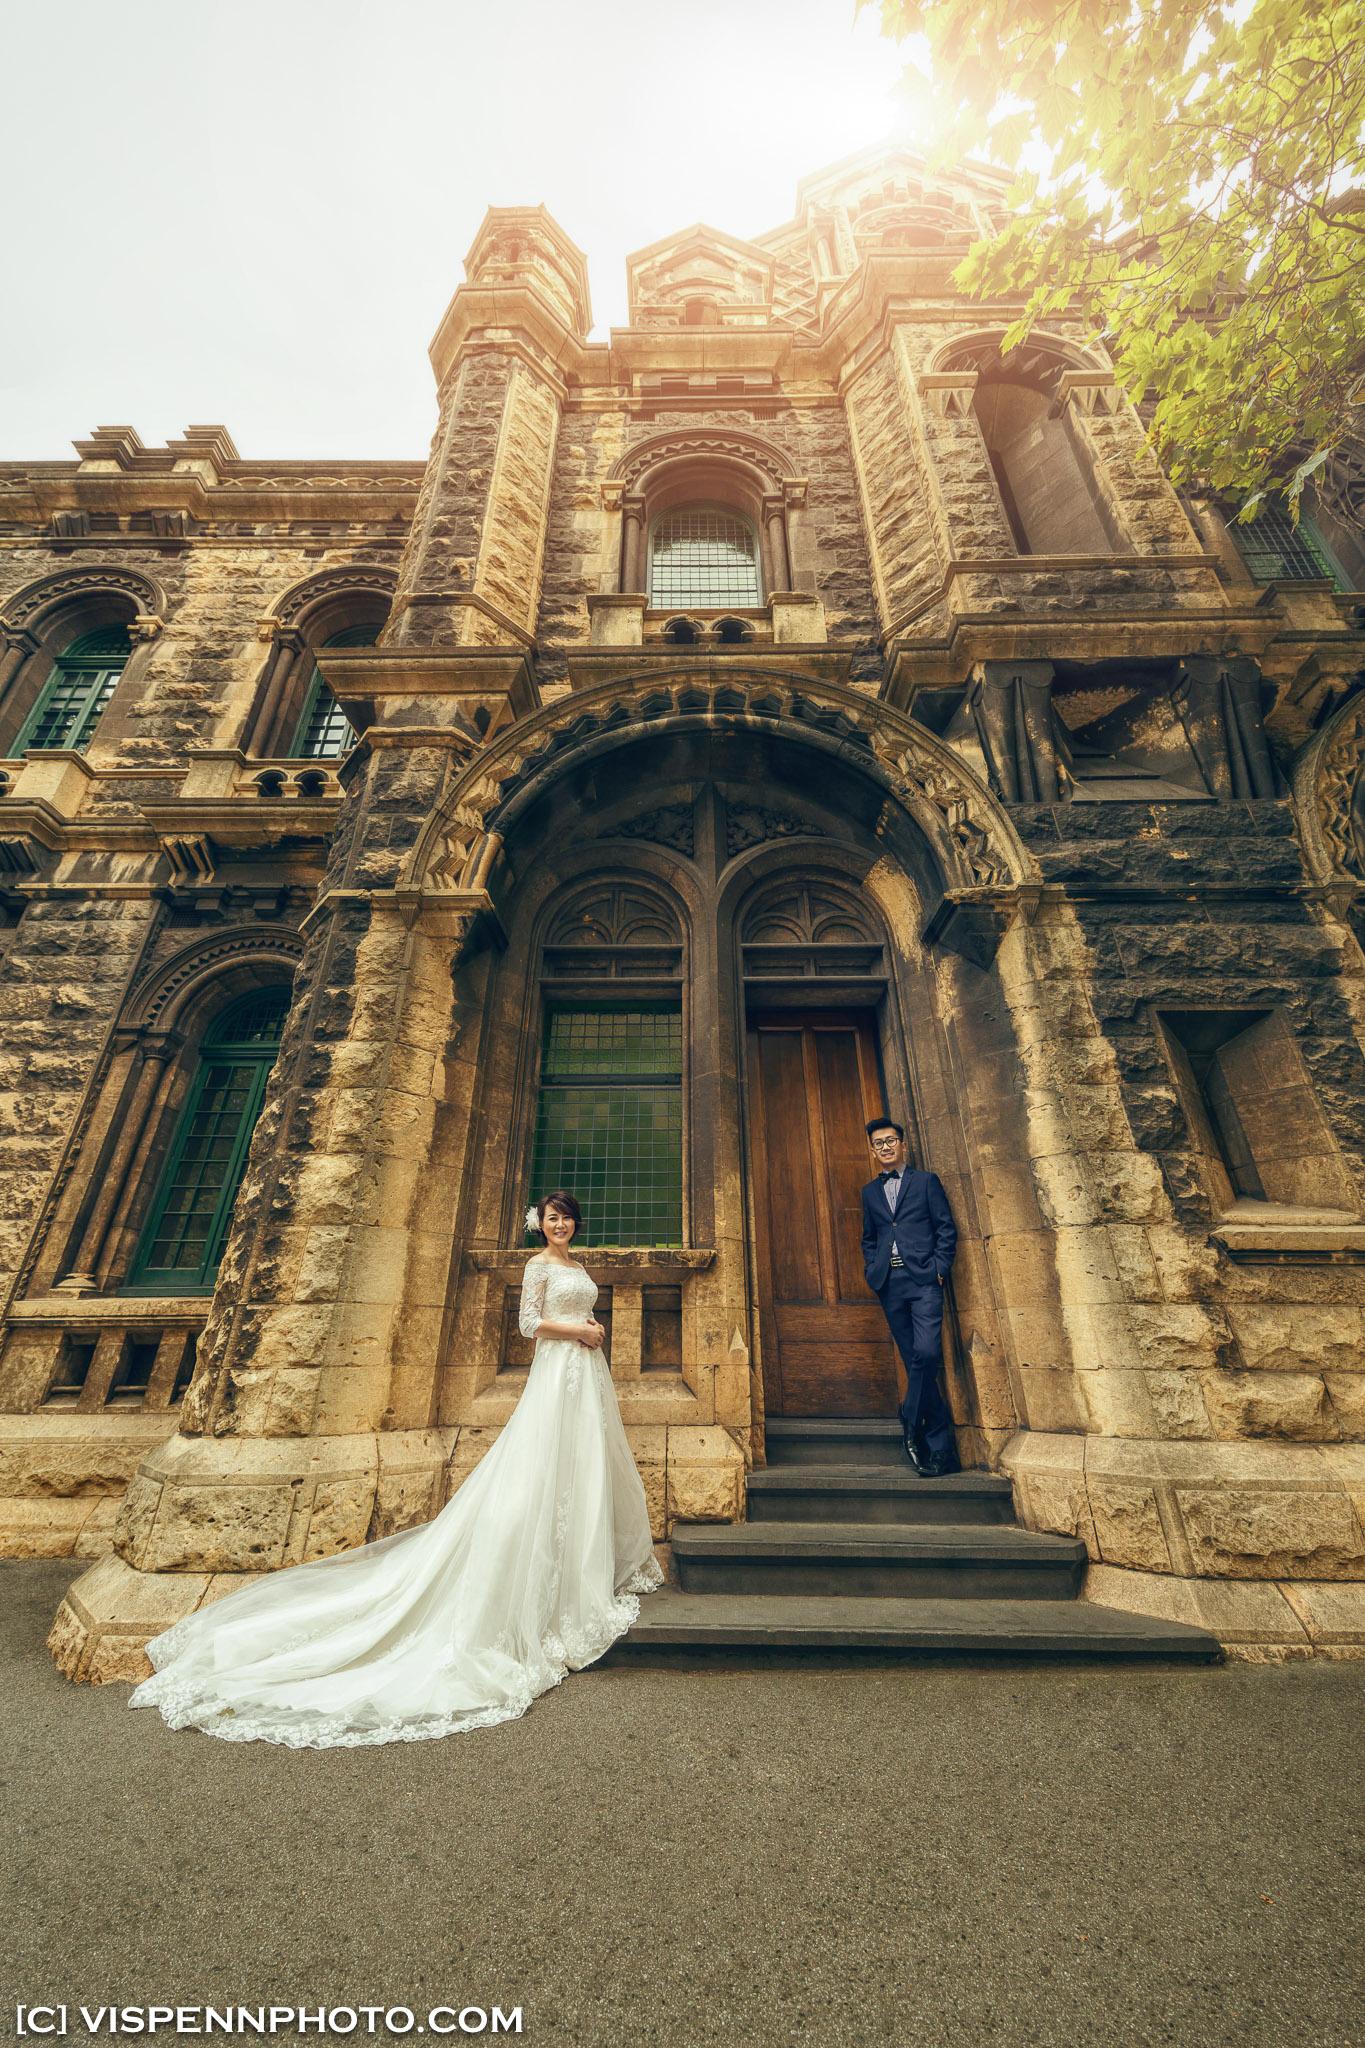 PRE WEDDING Photography Melbourne ZHPENN DaisyDanChenPreWedding 1515 1